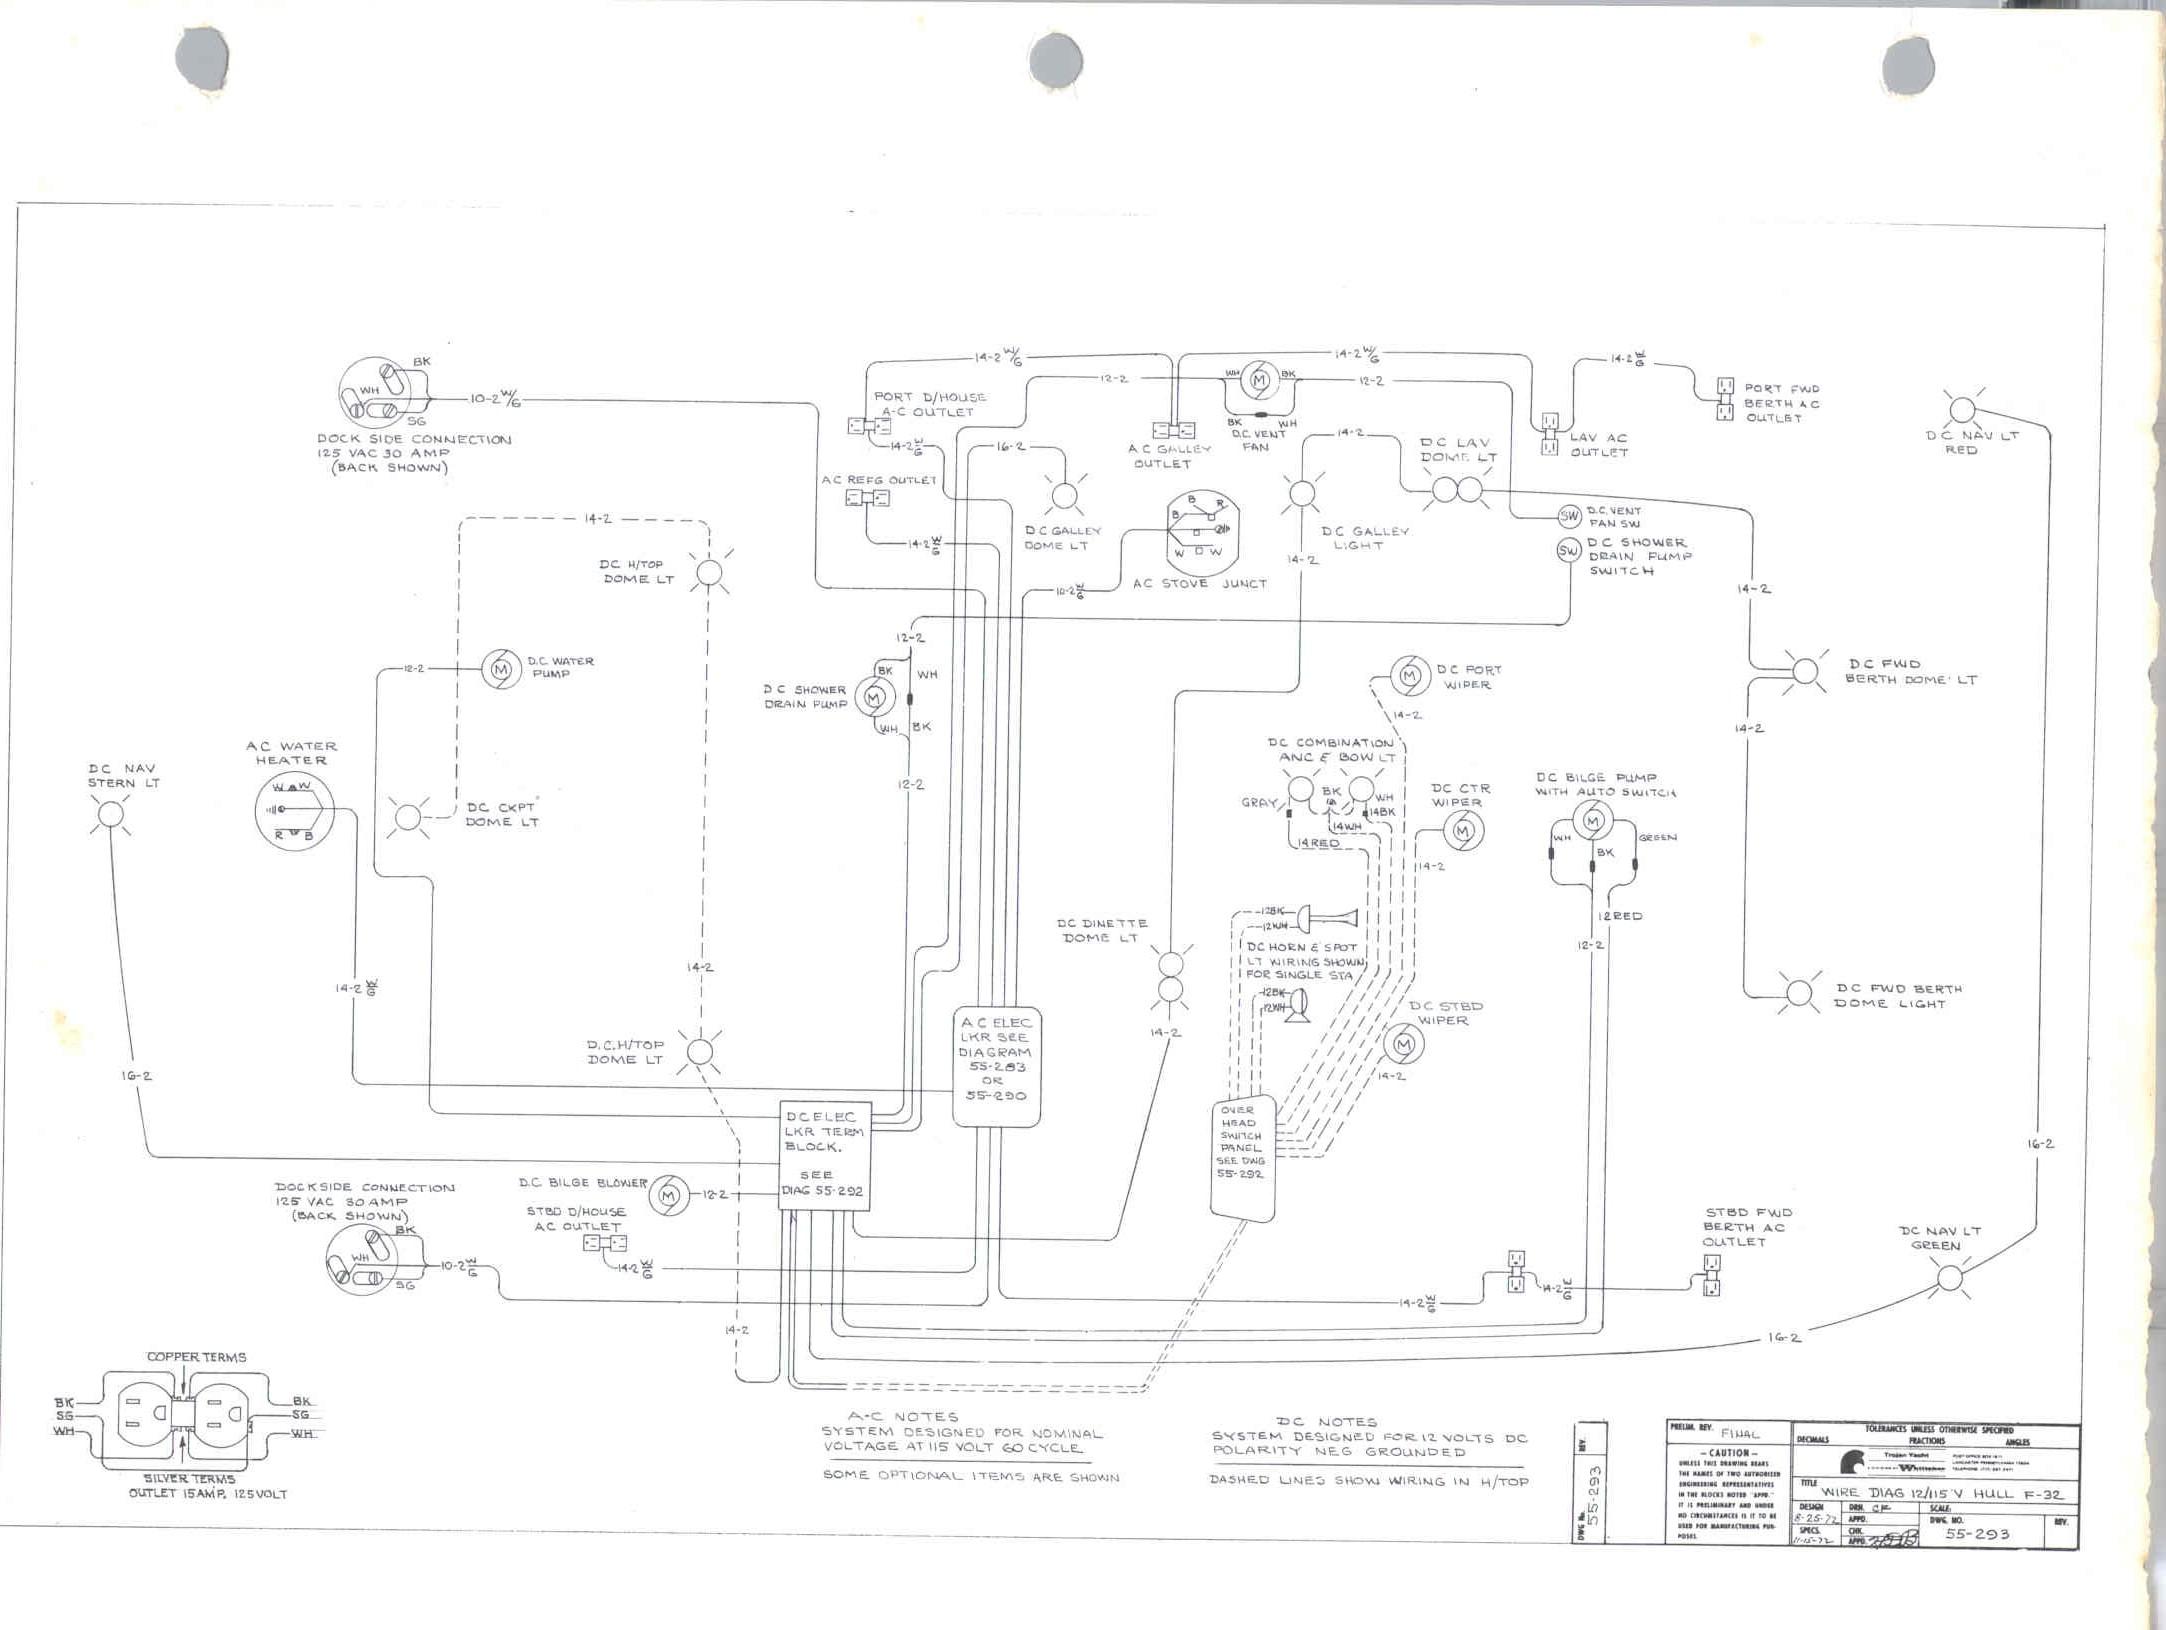 Aaon 27388 Wiring Diagrams Pdf | Wiring Diagram Database on